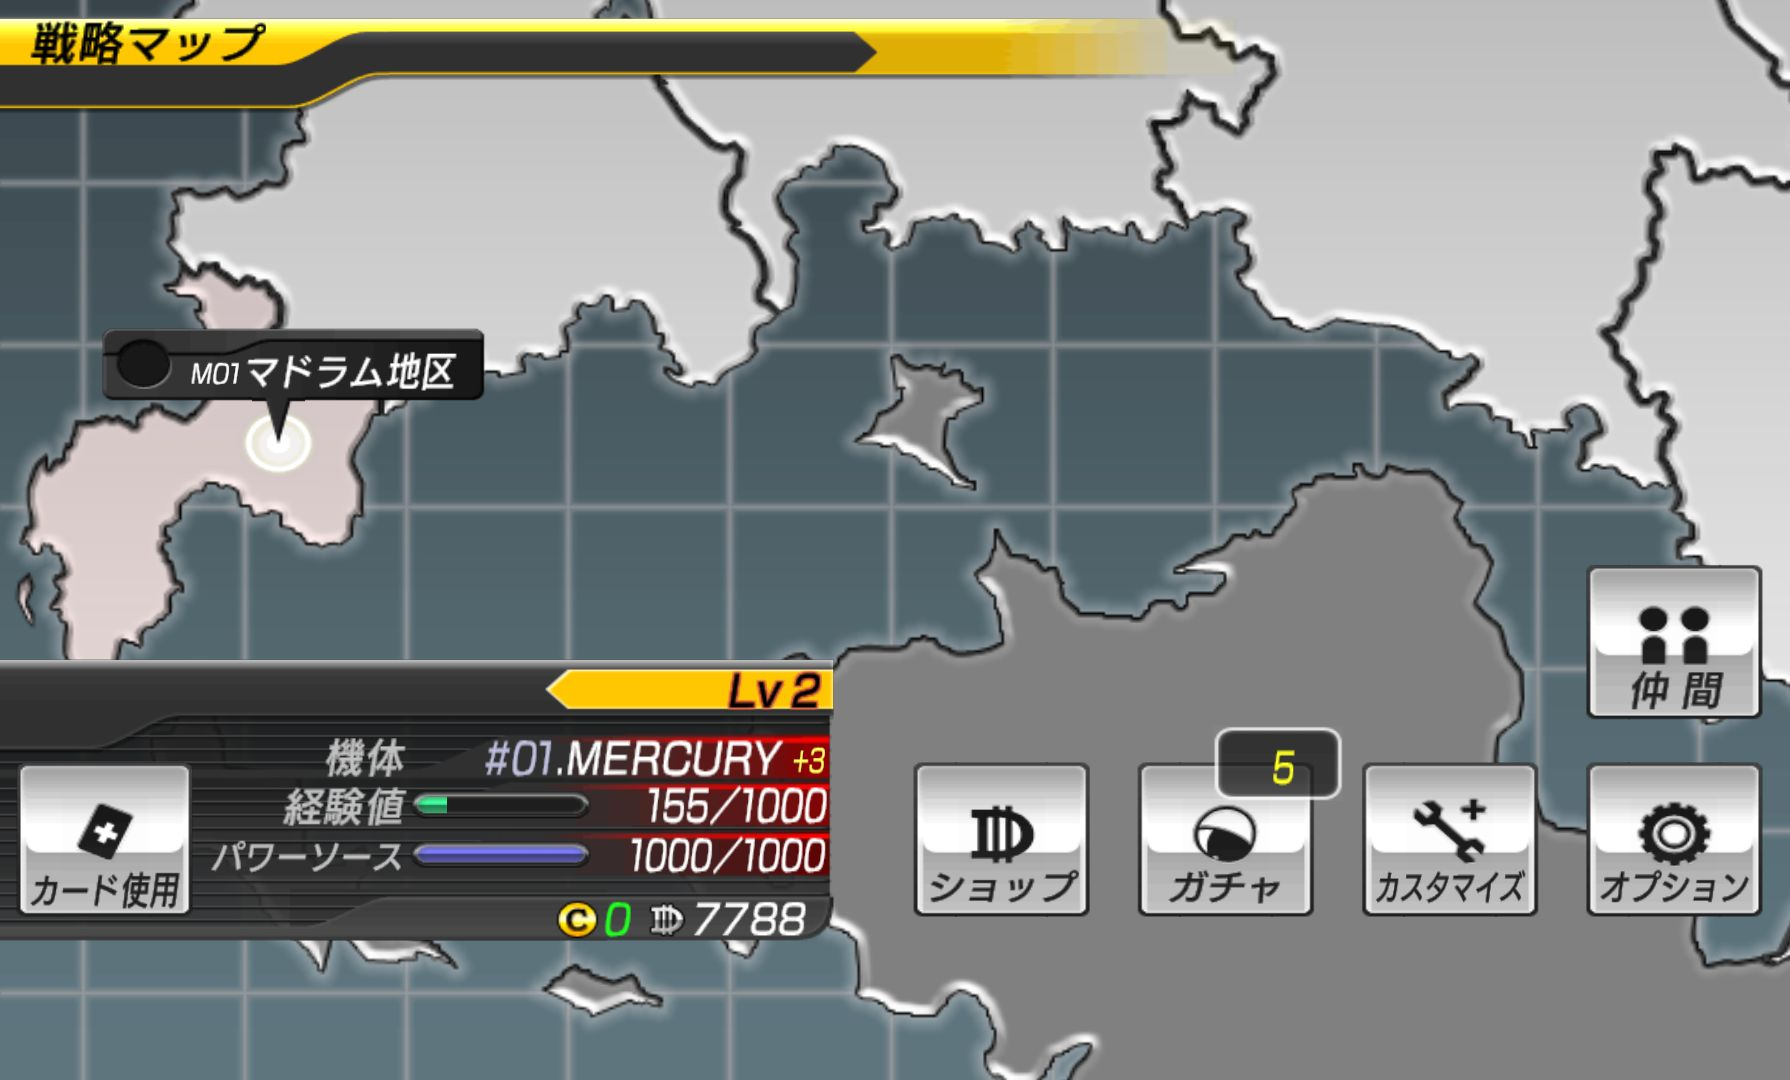 androidアプリ デストロイ・ガンナーズ シグマ(Destroy Gunners Σ)攻略スクリーンショット1